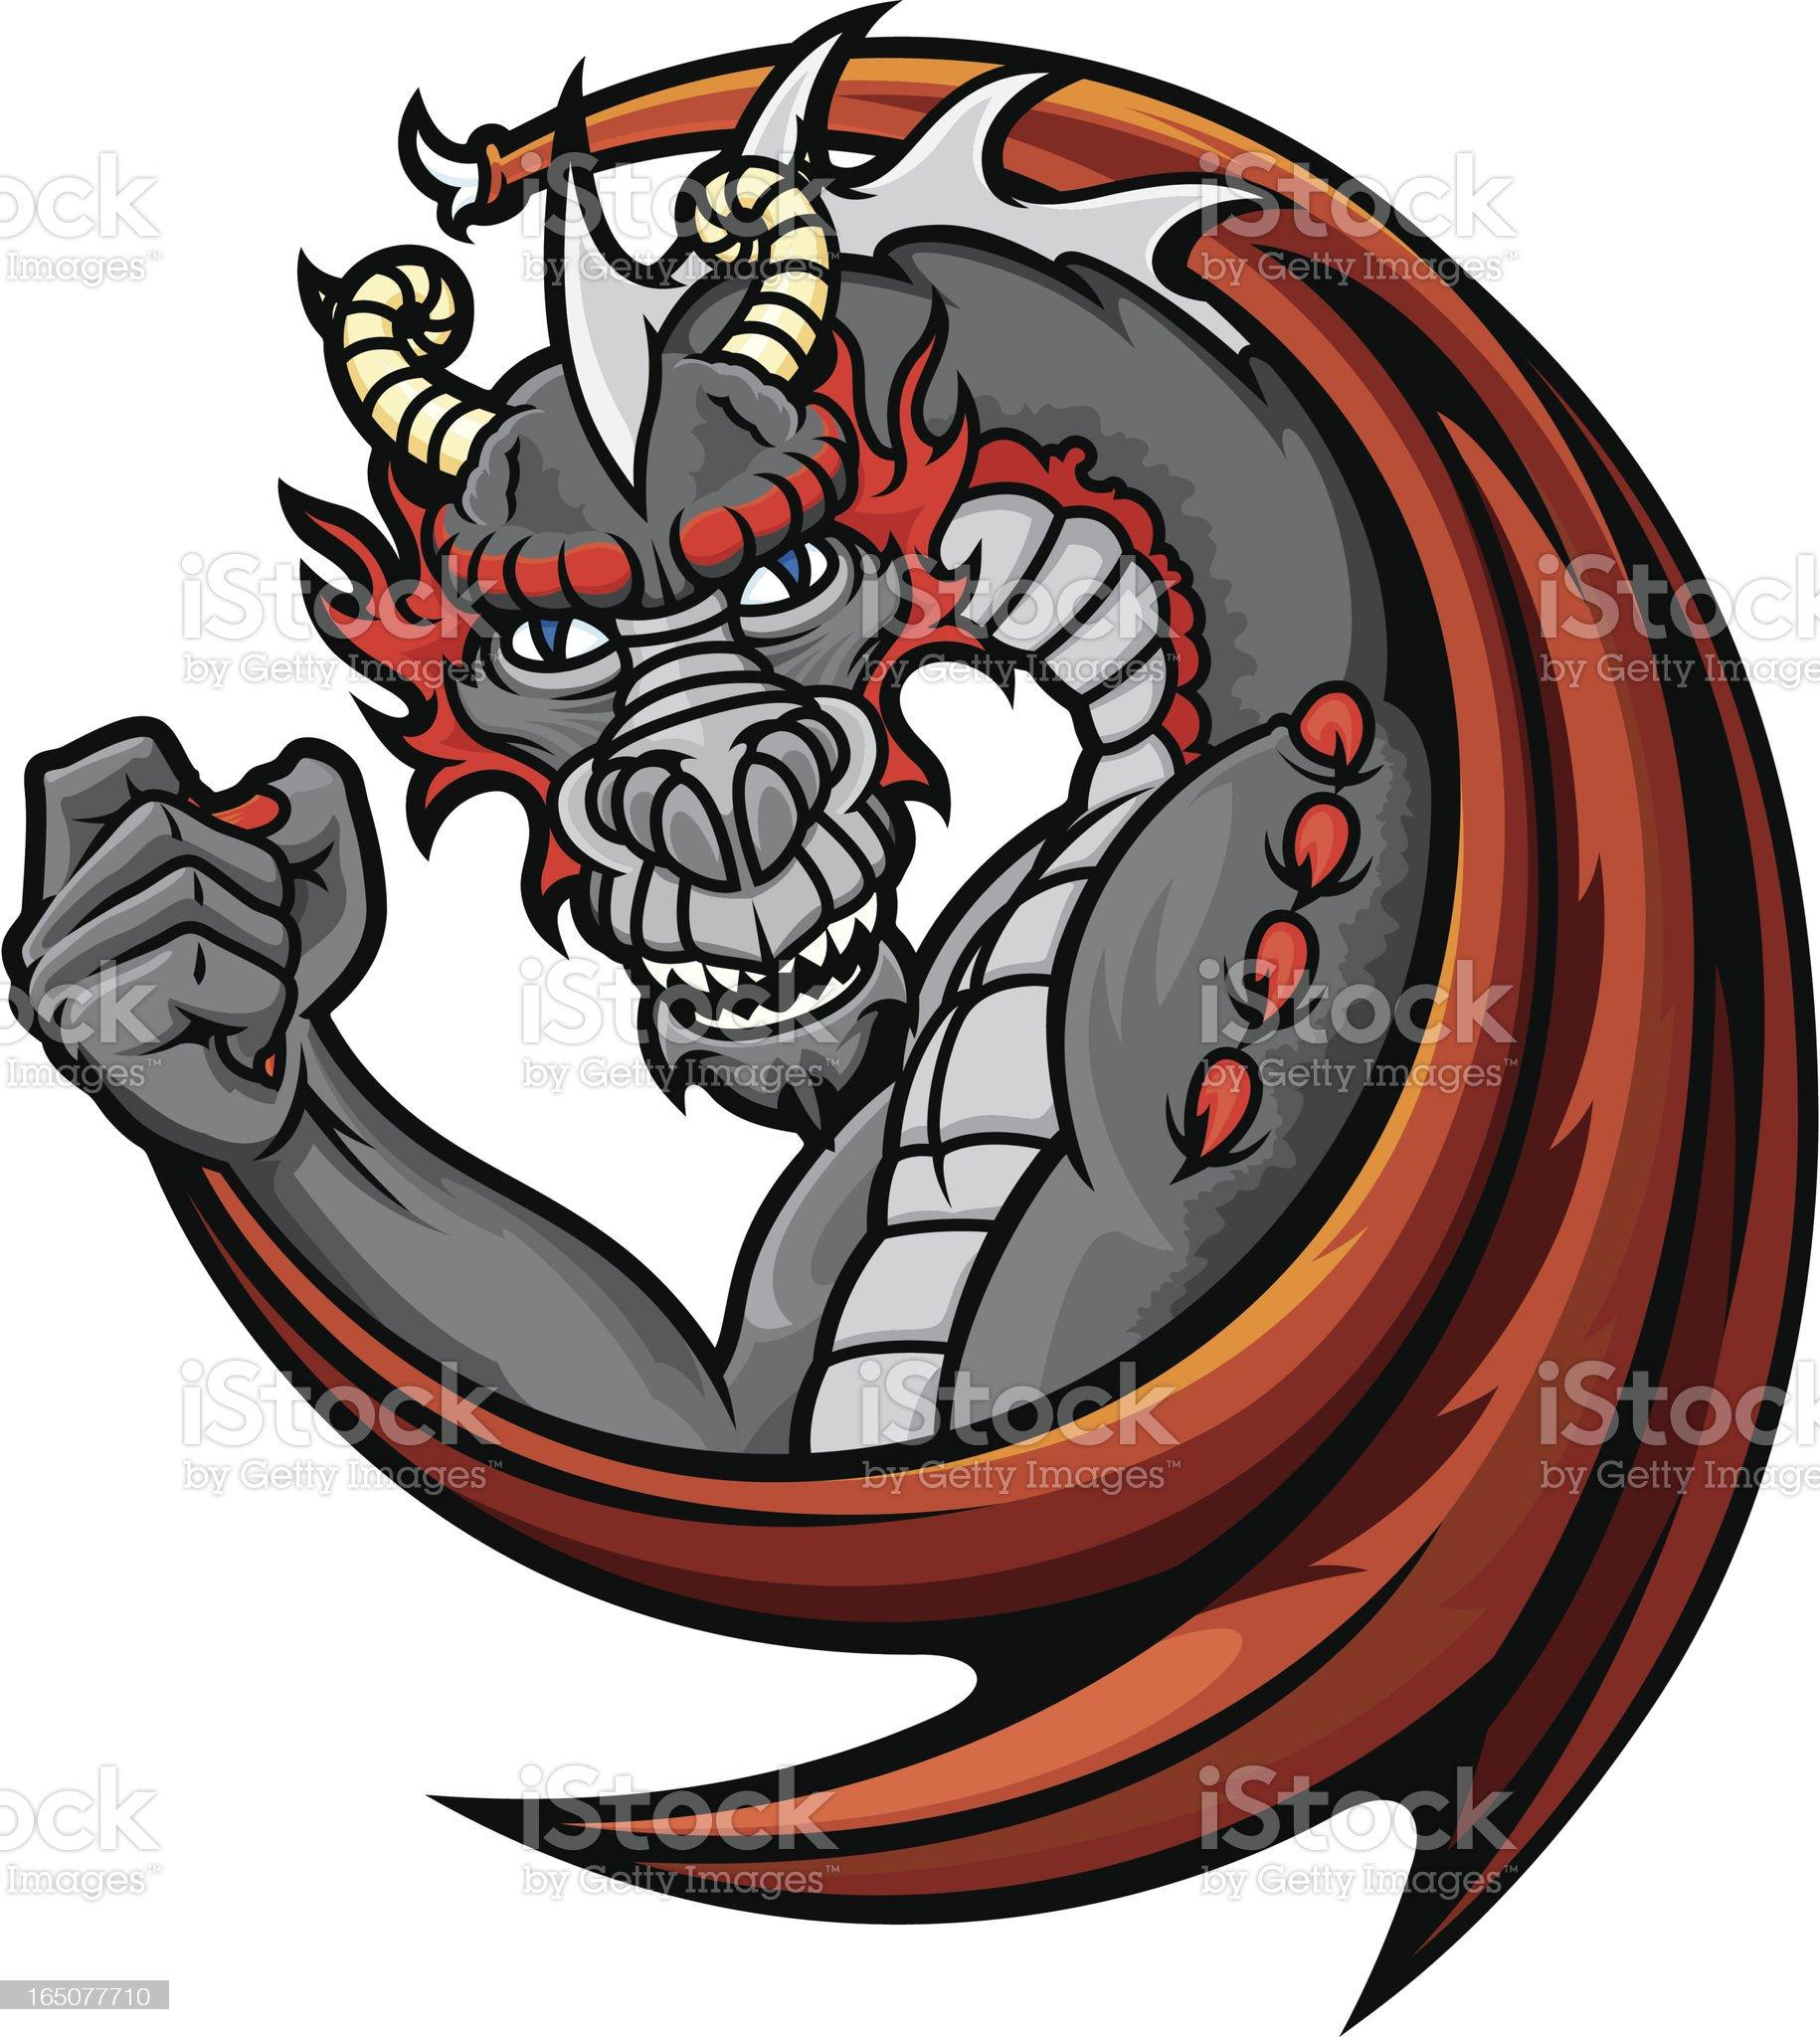 Dragon Champion royalty-free stock vector art